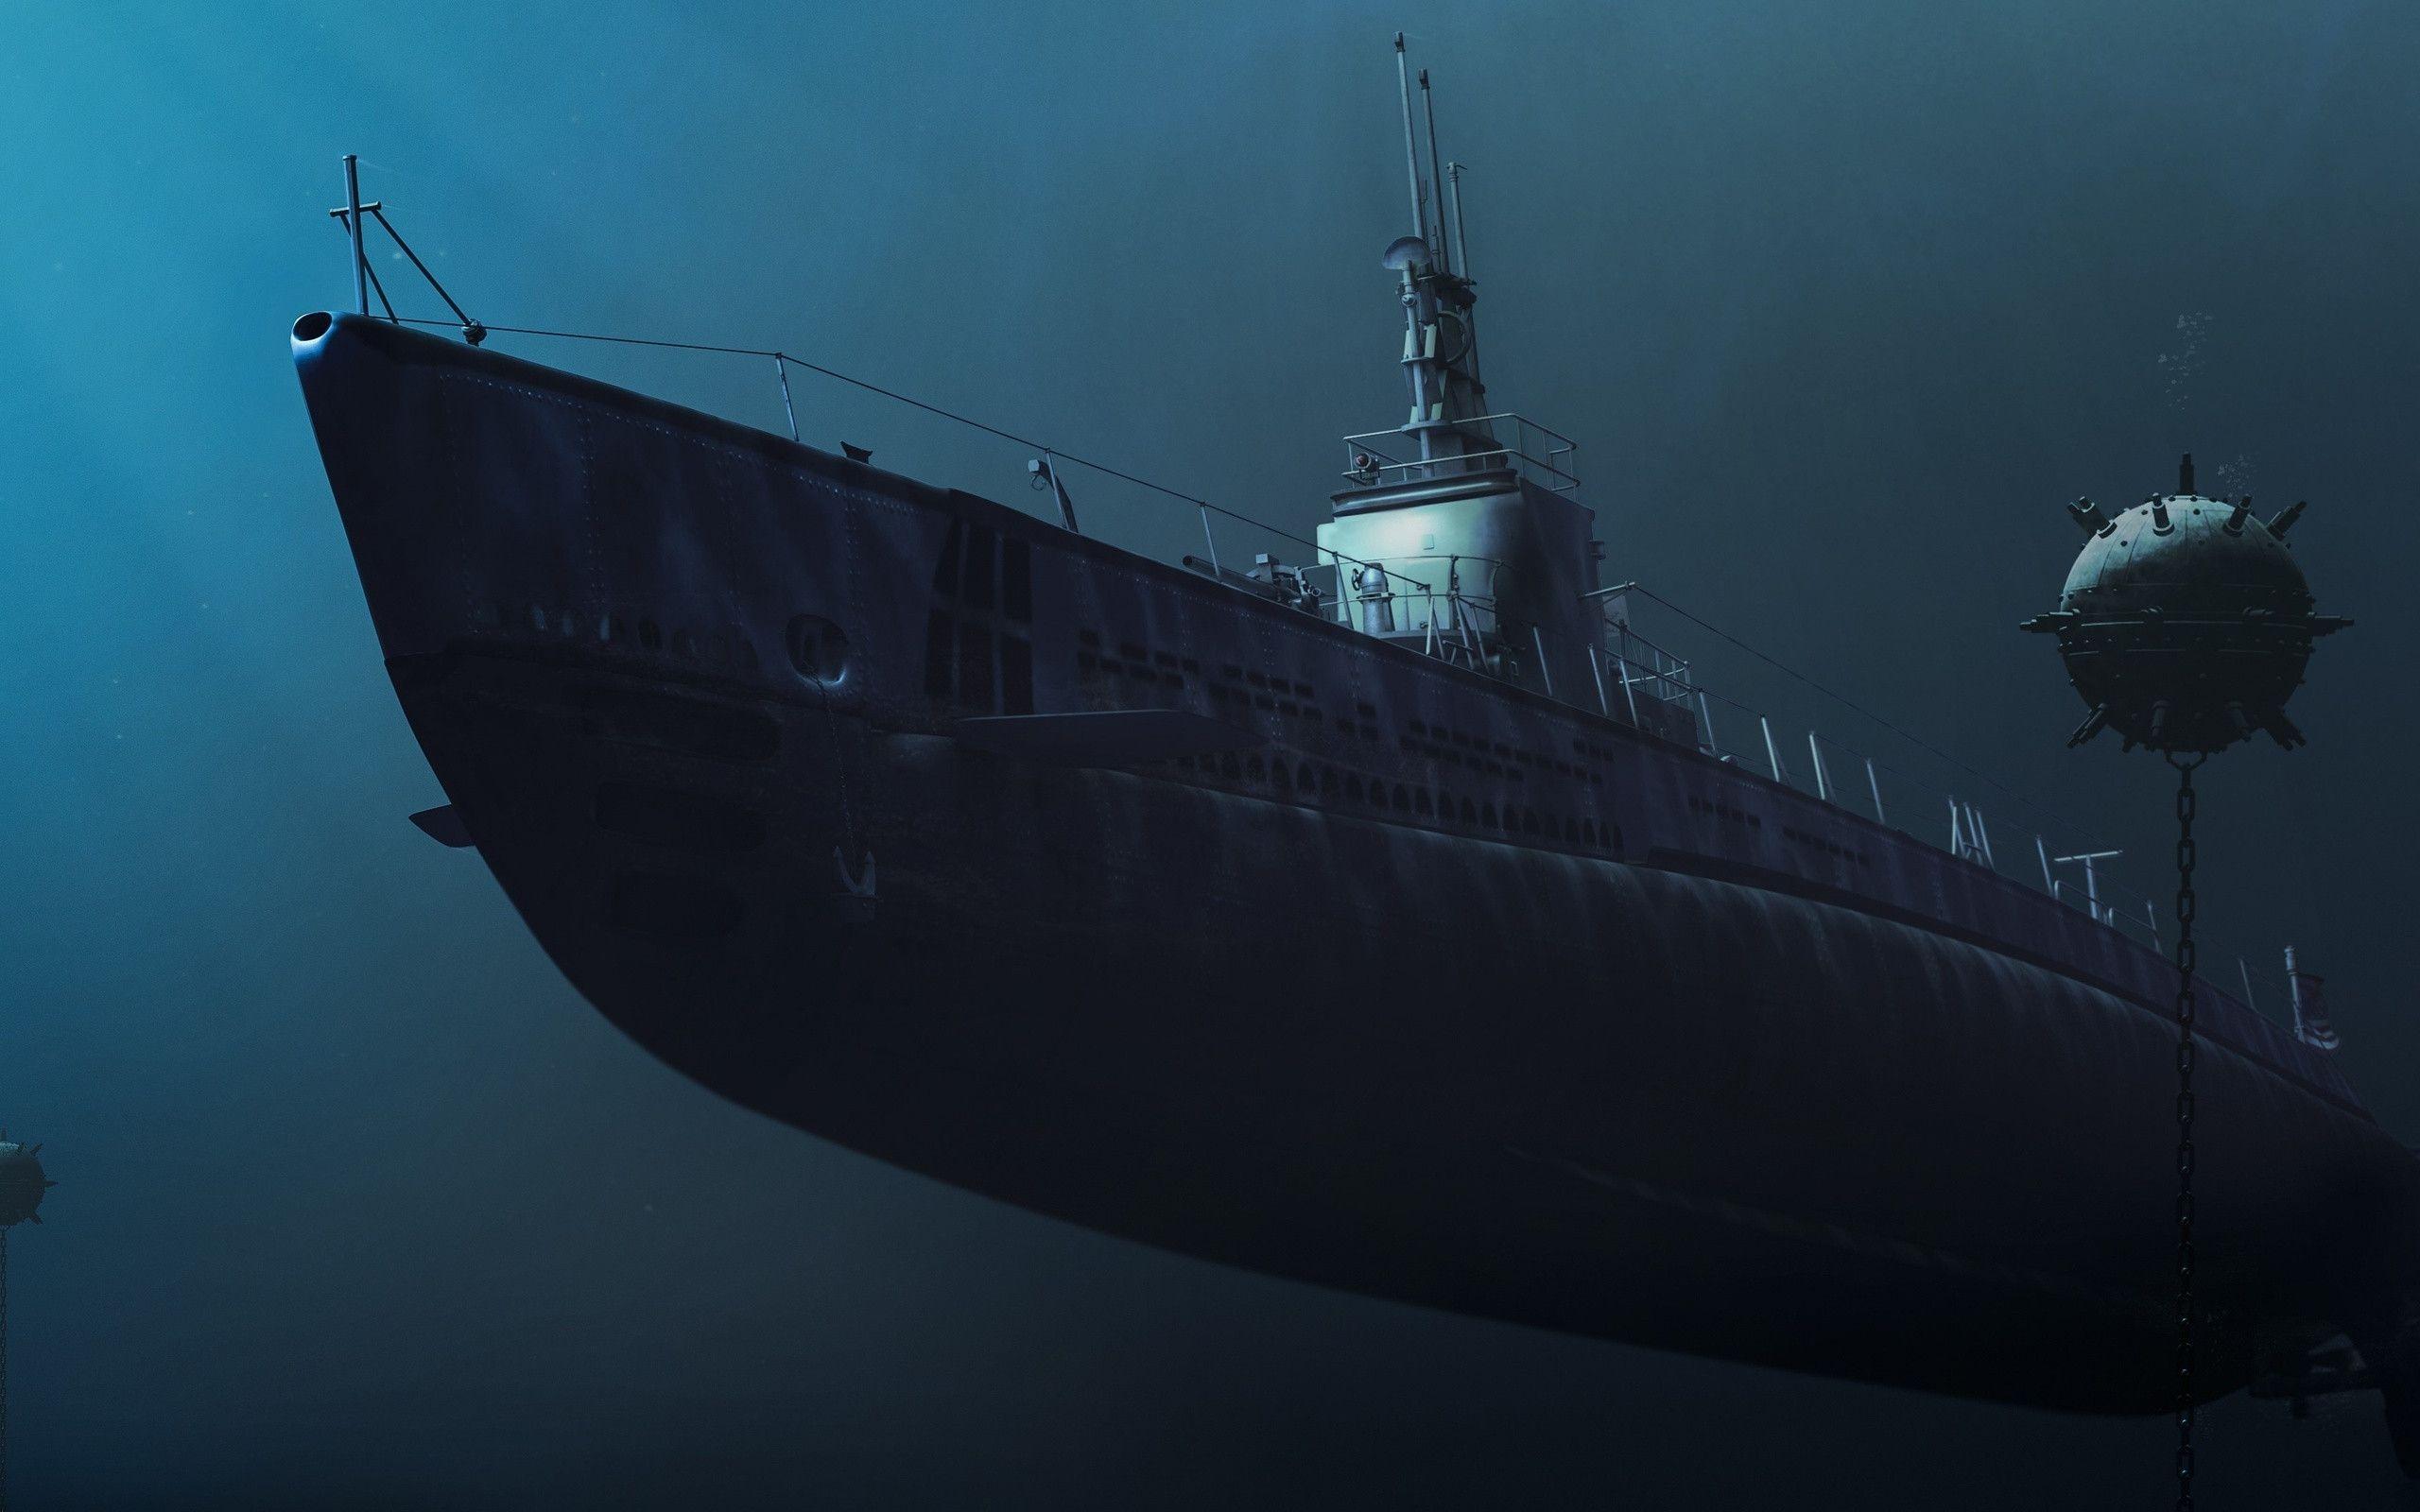 Submarine Wallpapers 2560x1600